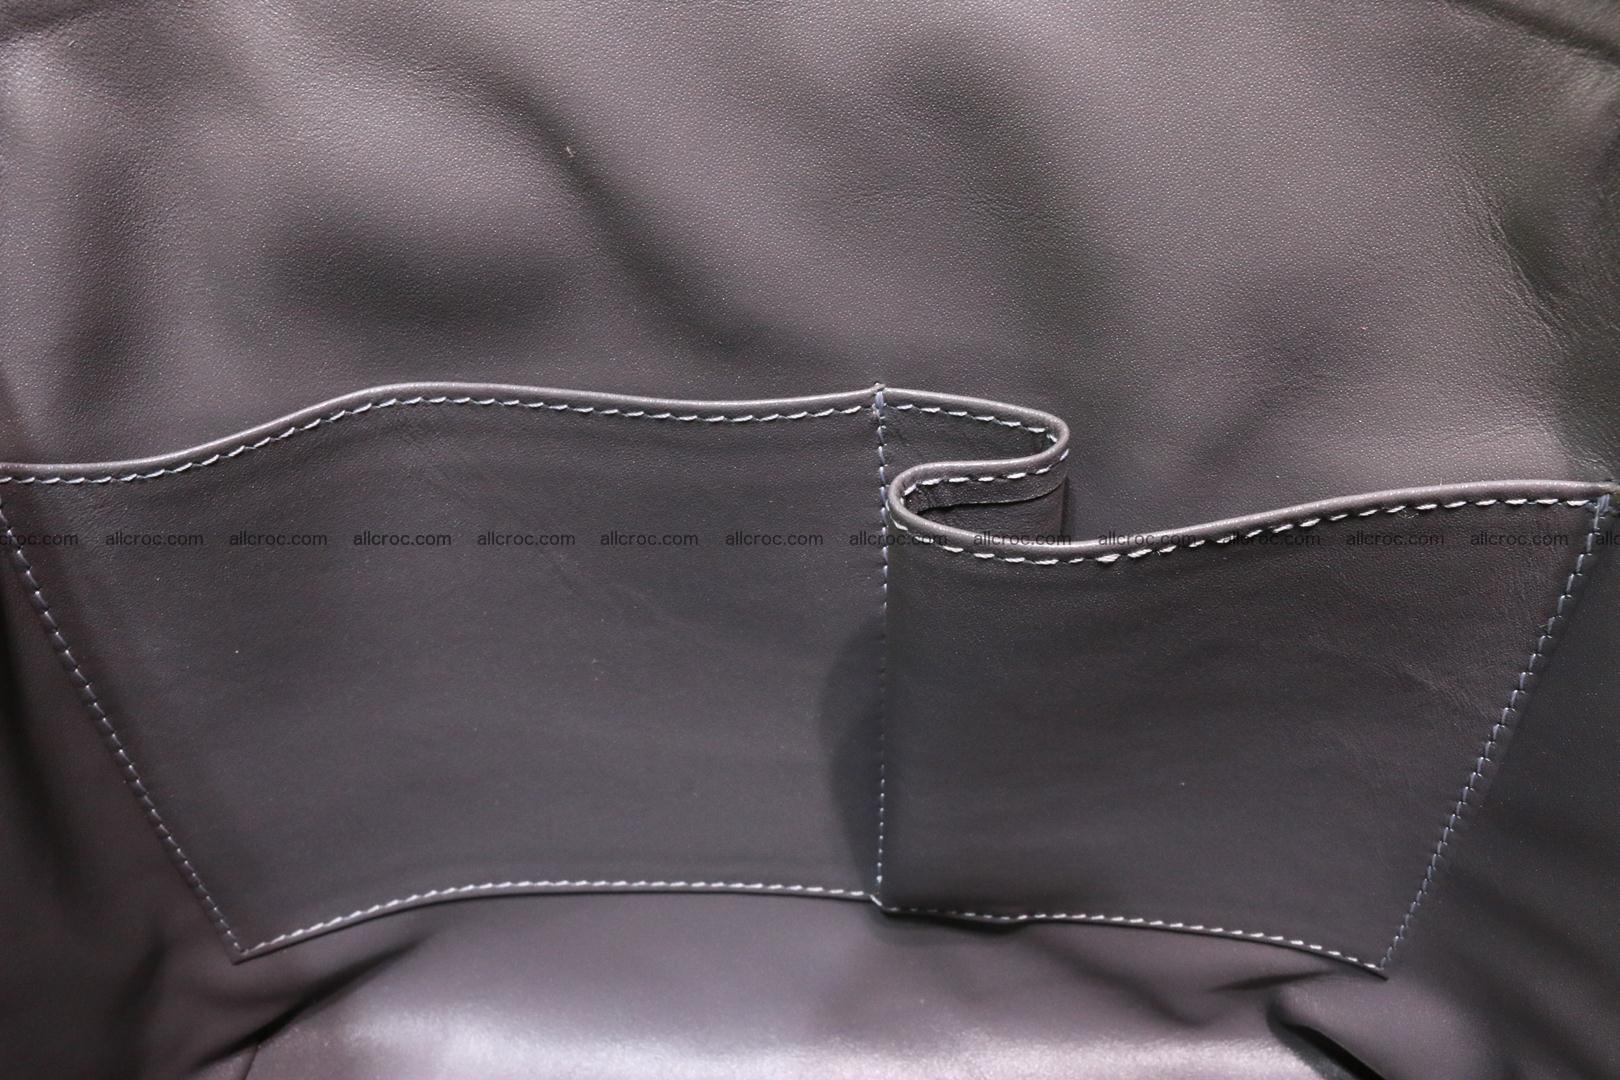 Genuine crocodile handbag for ladies 049 Foto 14